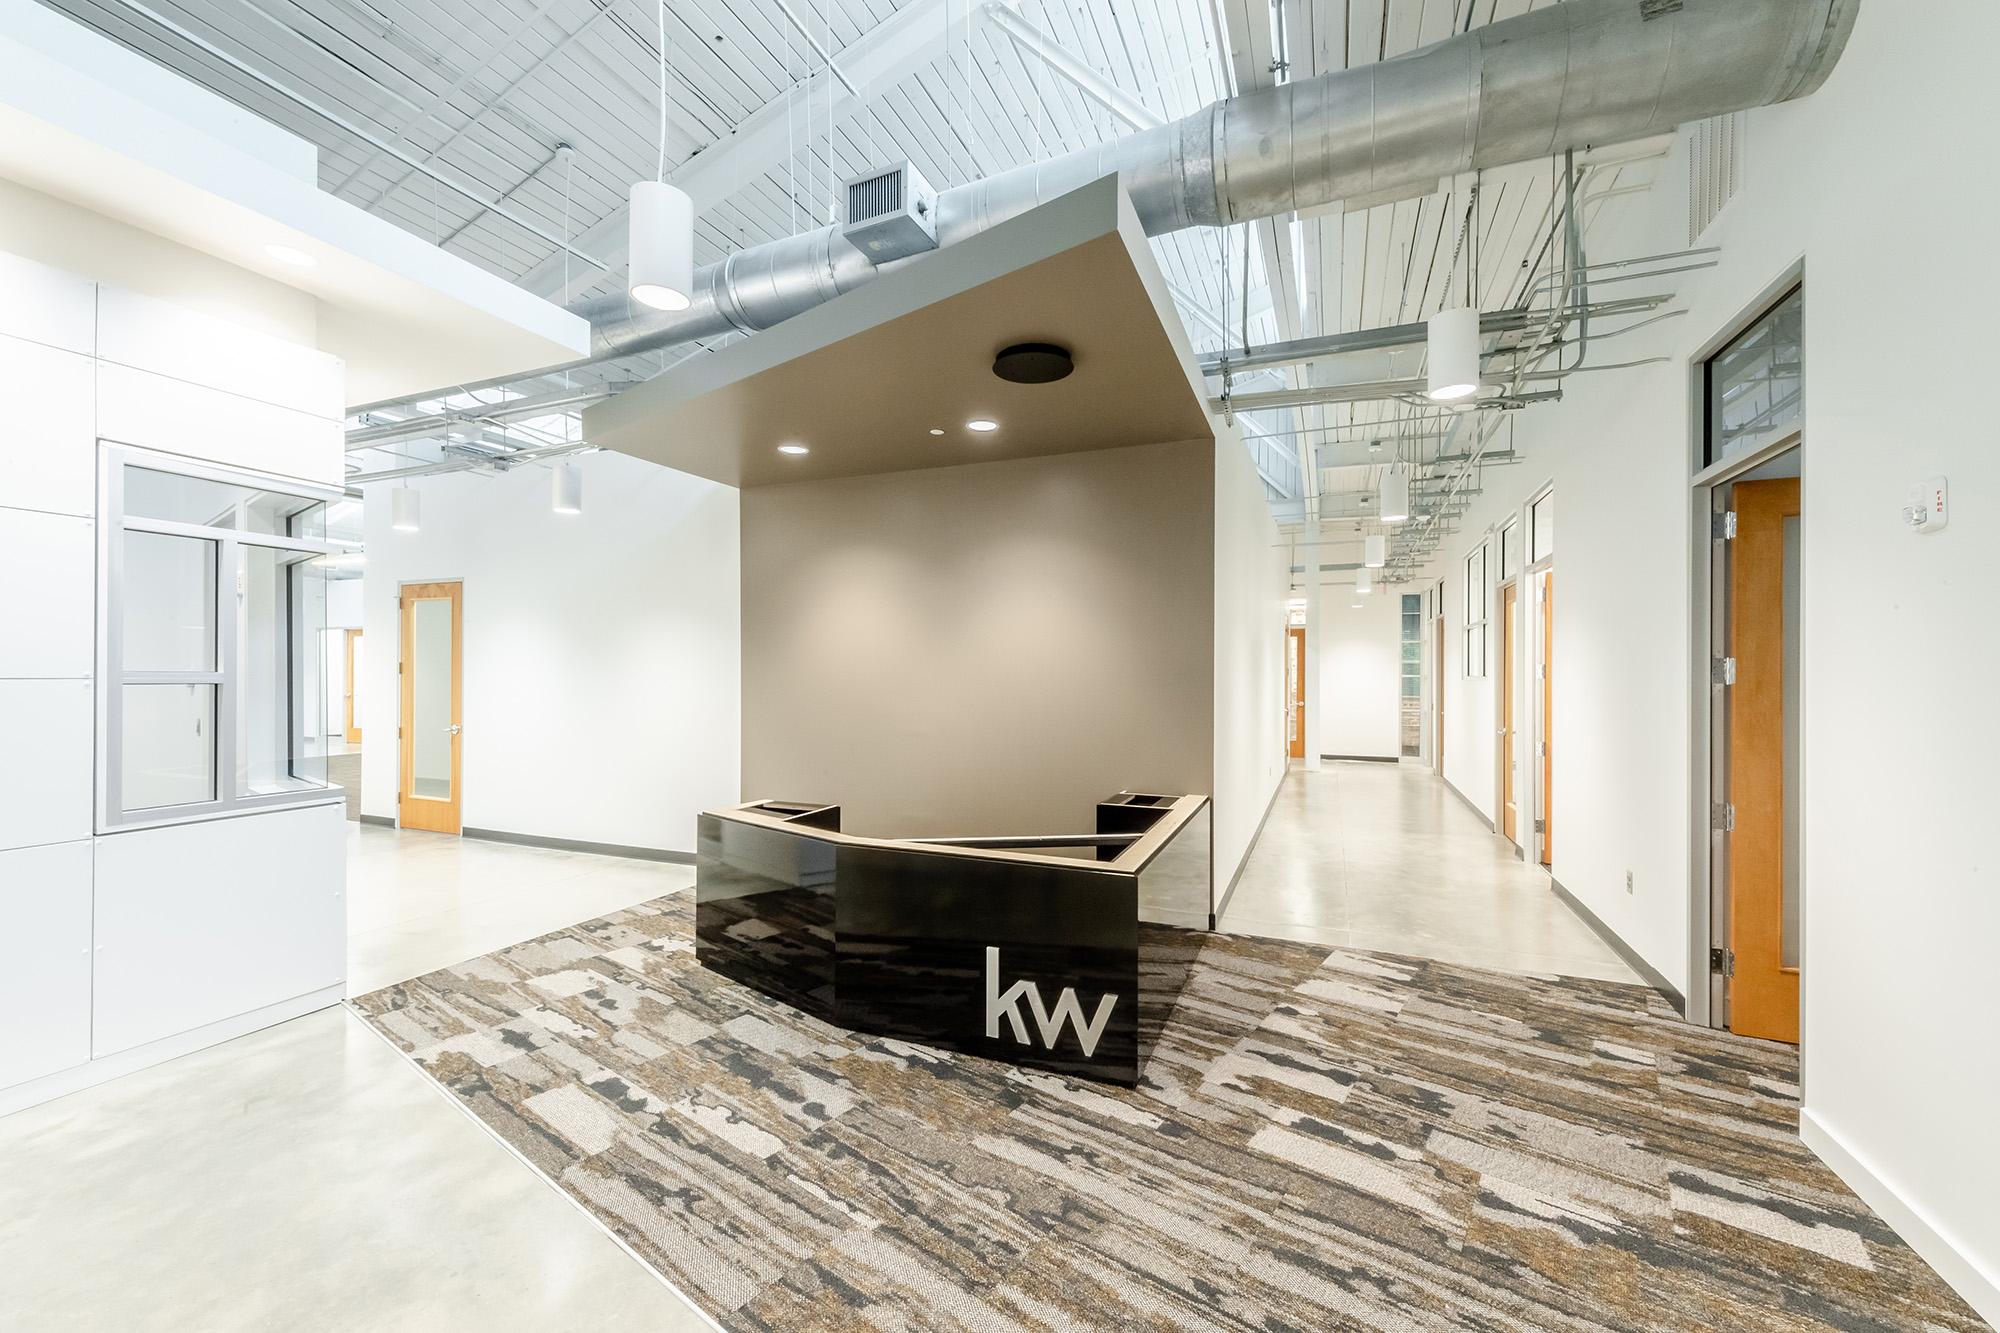 Assets Construction Portfolio: KW Intown